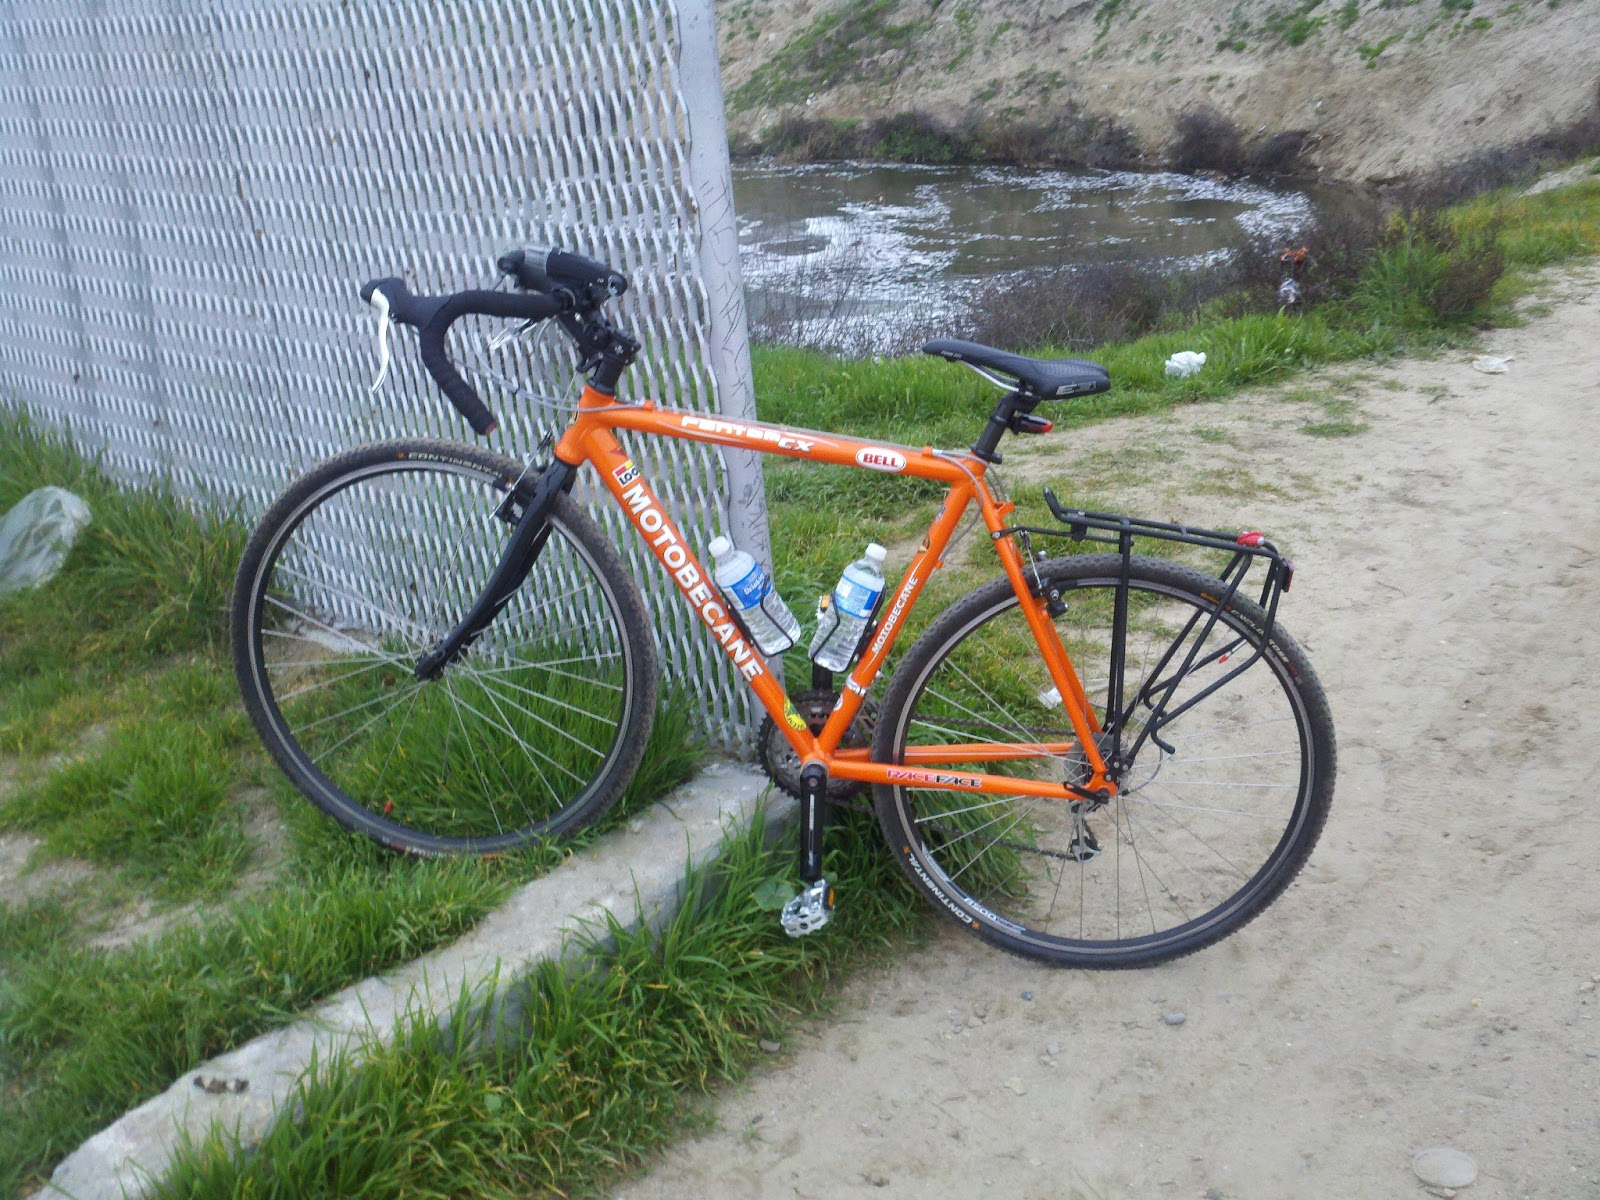 Biking For The Old And The Restless Motobecane Fantom